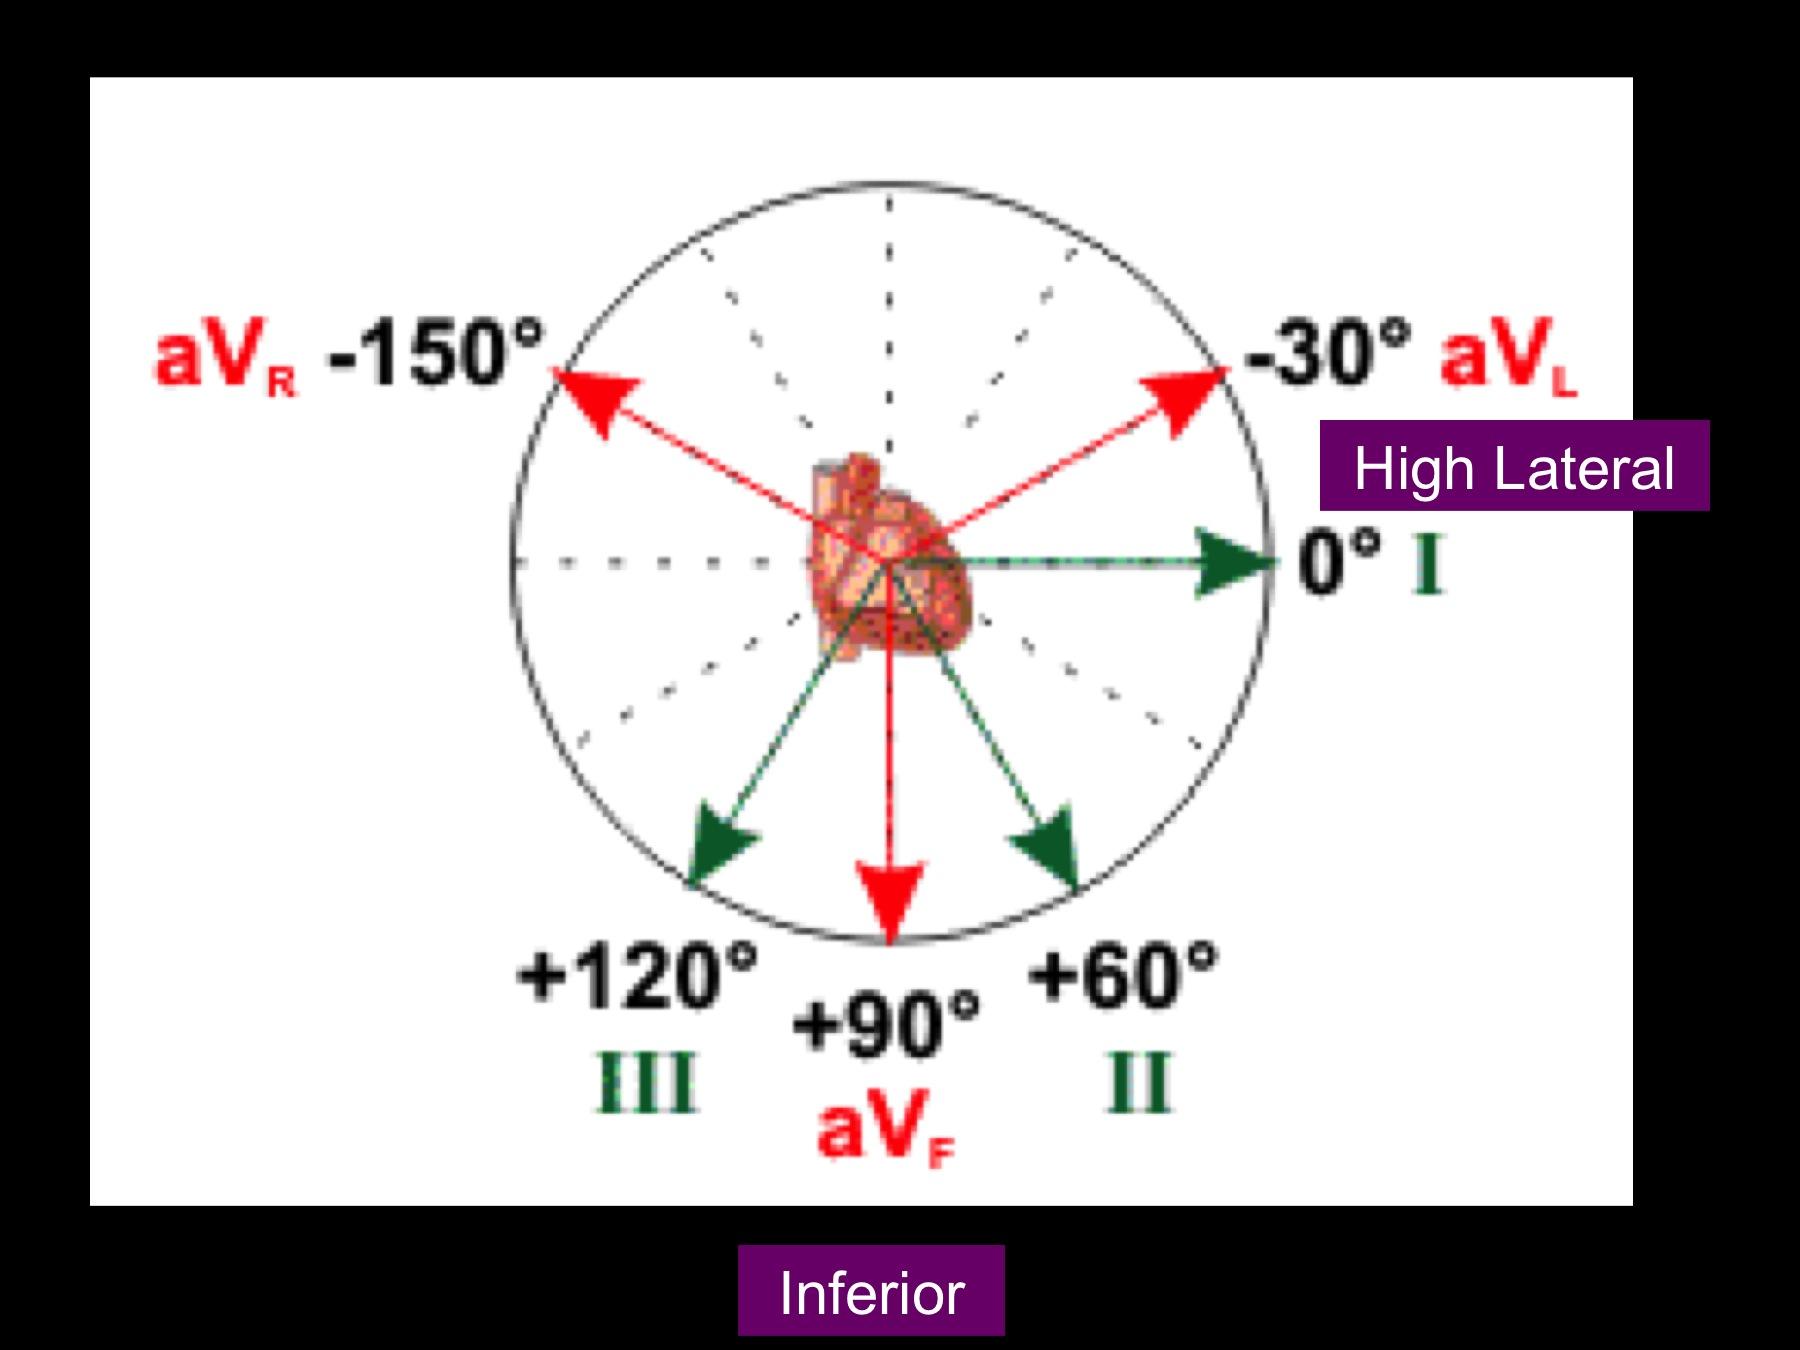 4 lead ekg placement diagram wiring adalah myocardial ischaemia  ecg correlation coremed